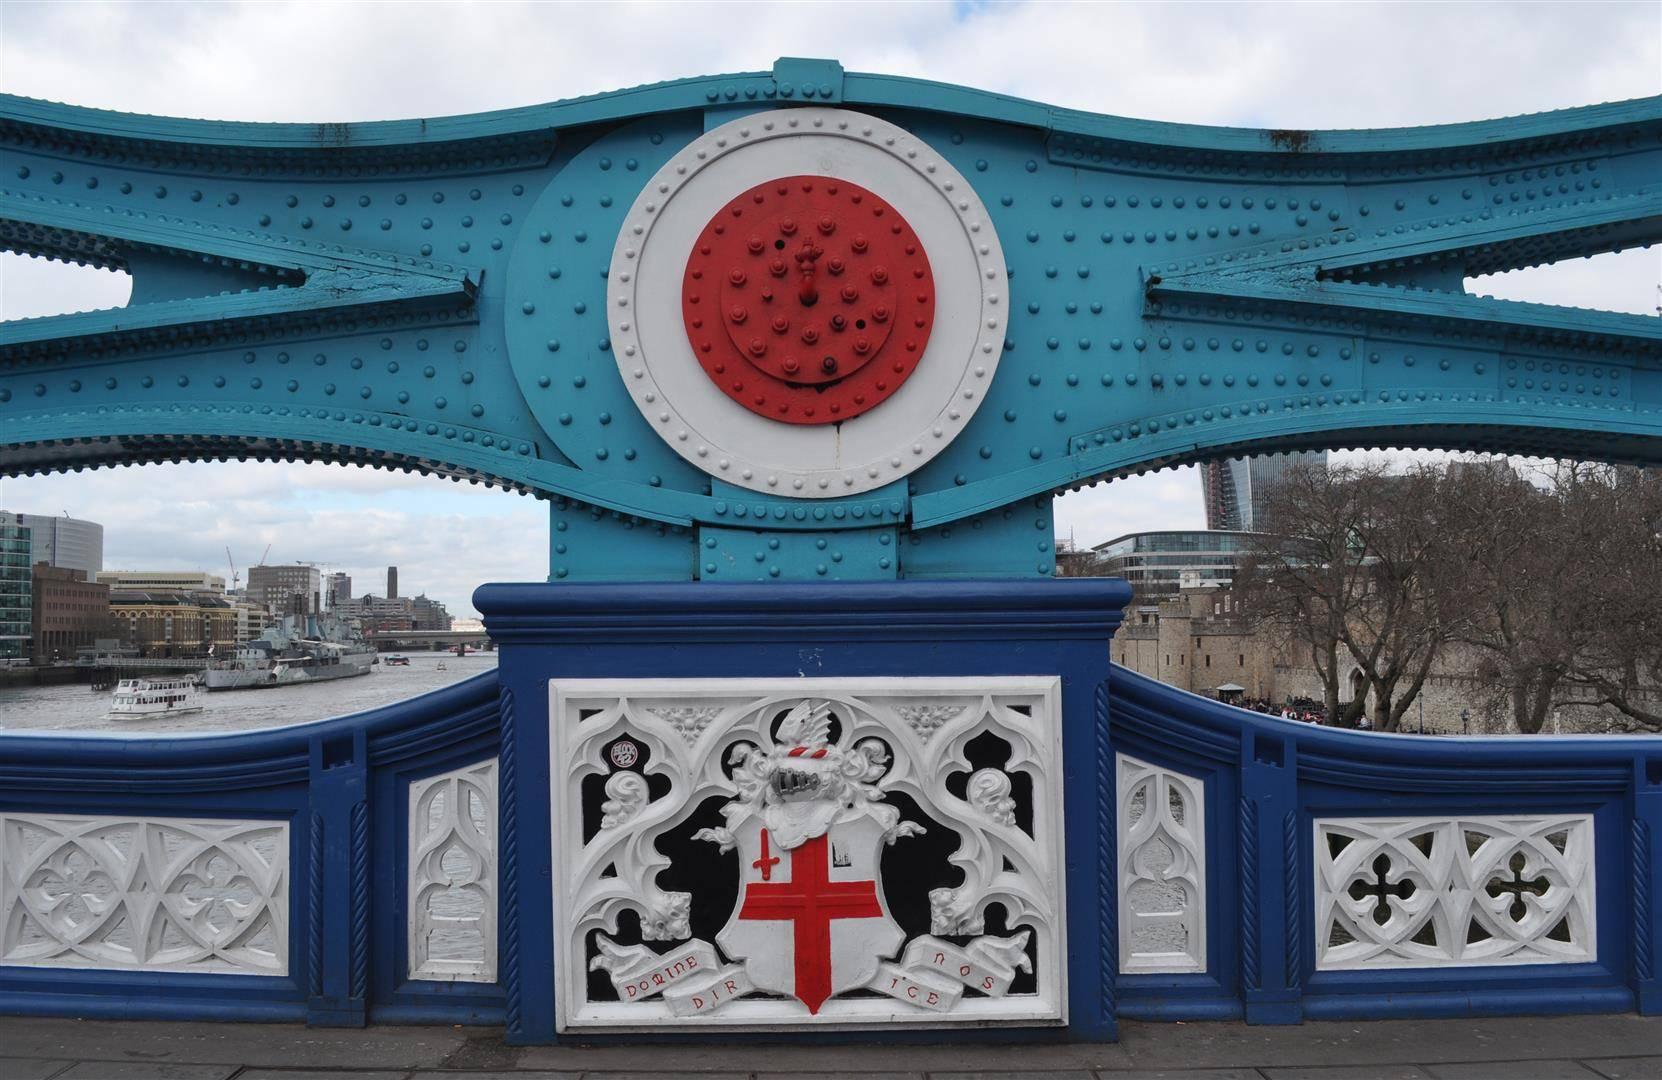 Tower Bridge Detail, London